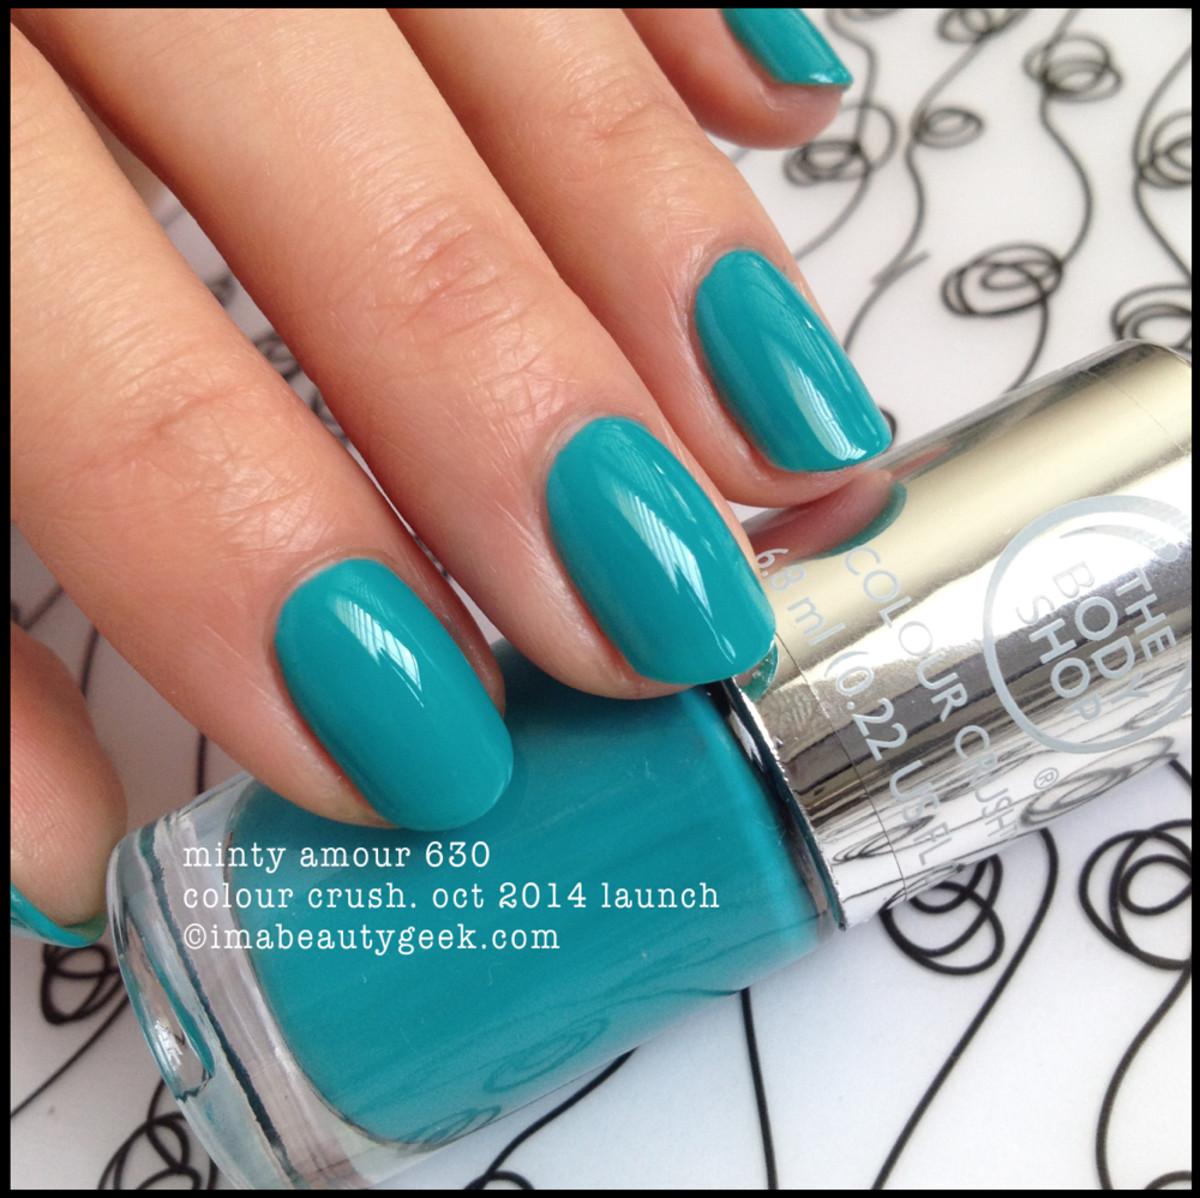 Body Shop Polish Minty Amour 630 Colour Crush